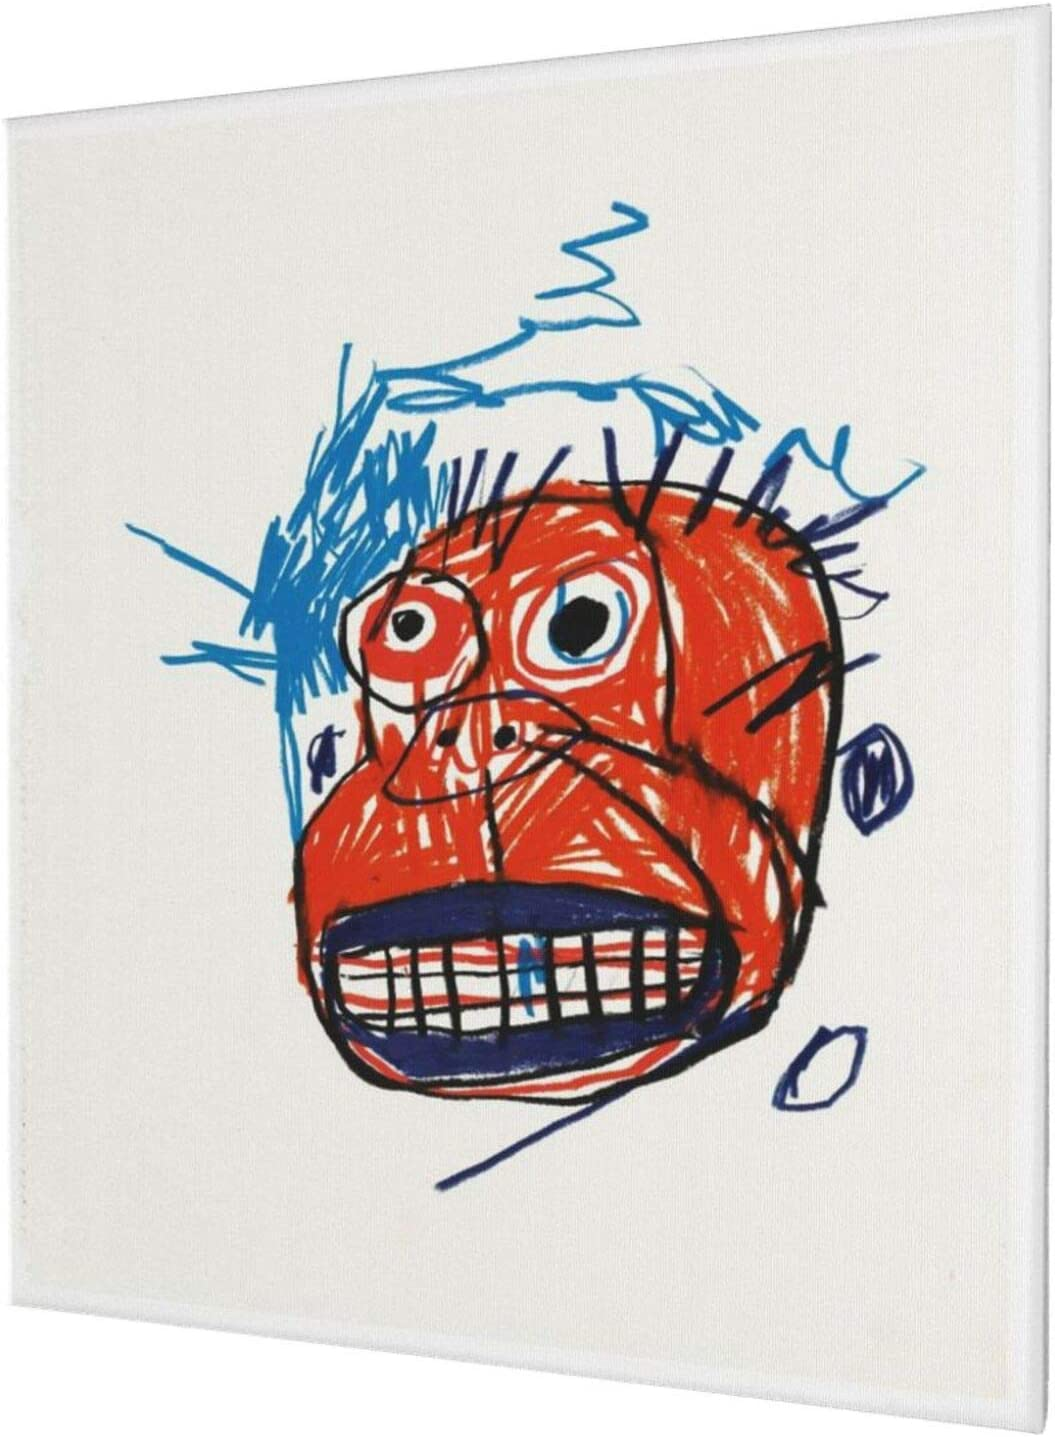 Untitled 16 Jean-Michel Basquiat Canvas Large Wall Art 値下げ Reprodu 超歓迎された